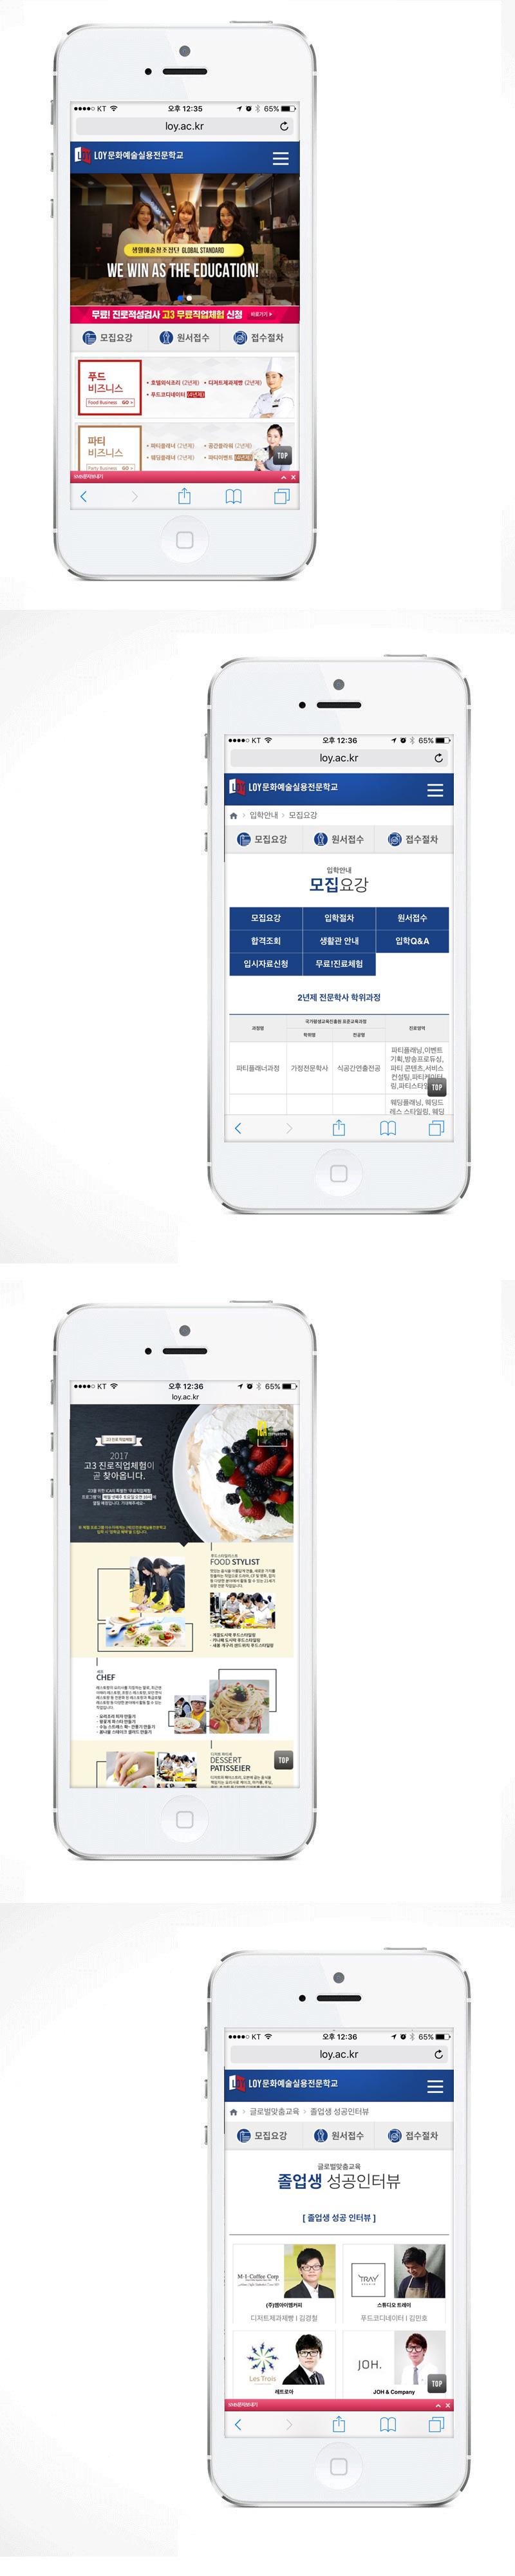 mobile_loy.jpg